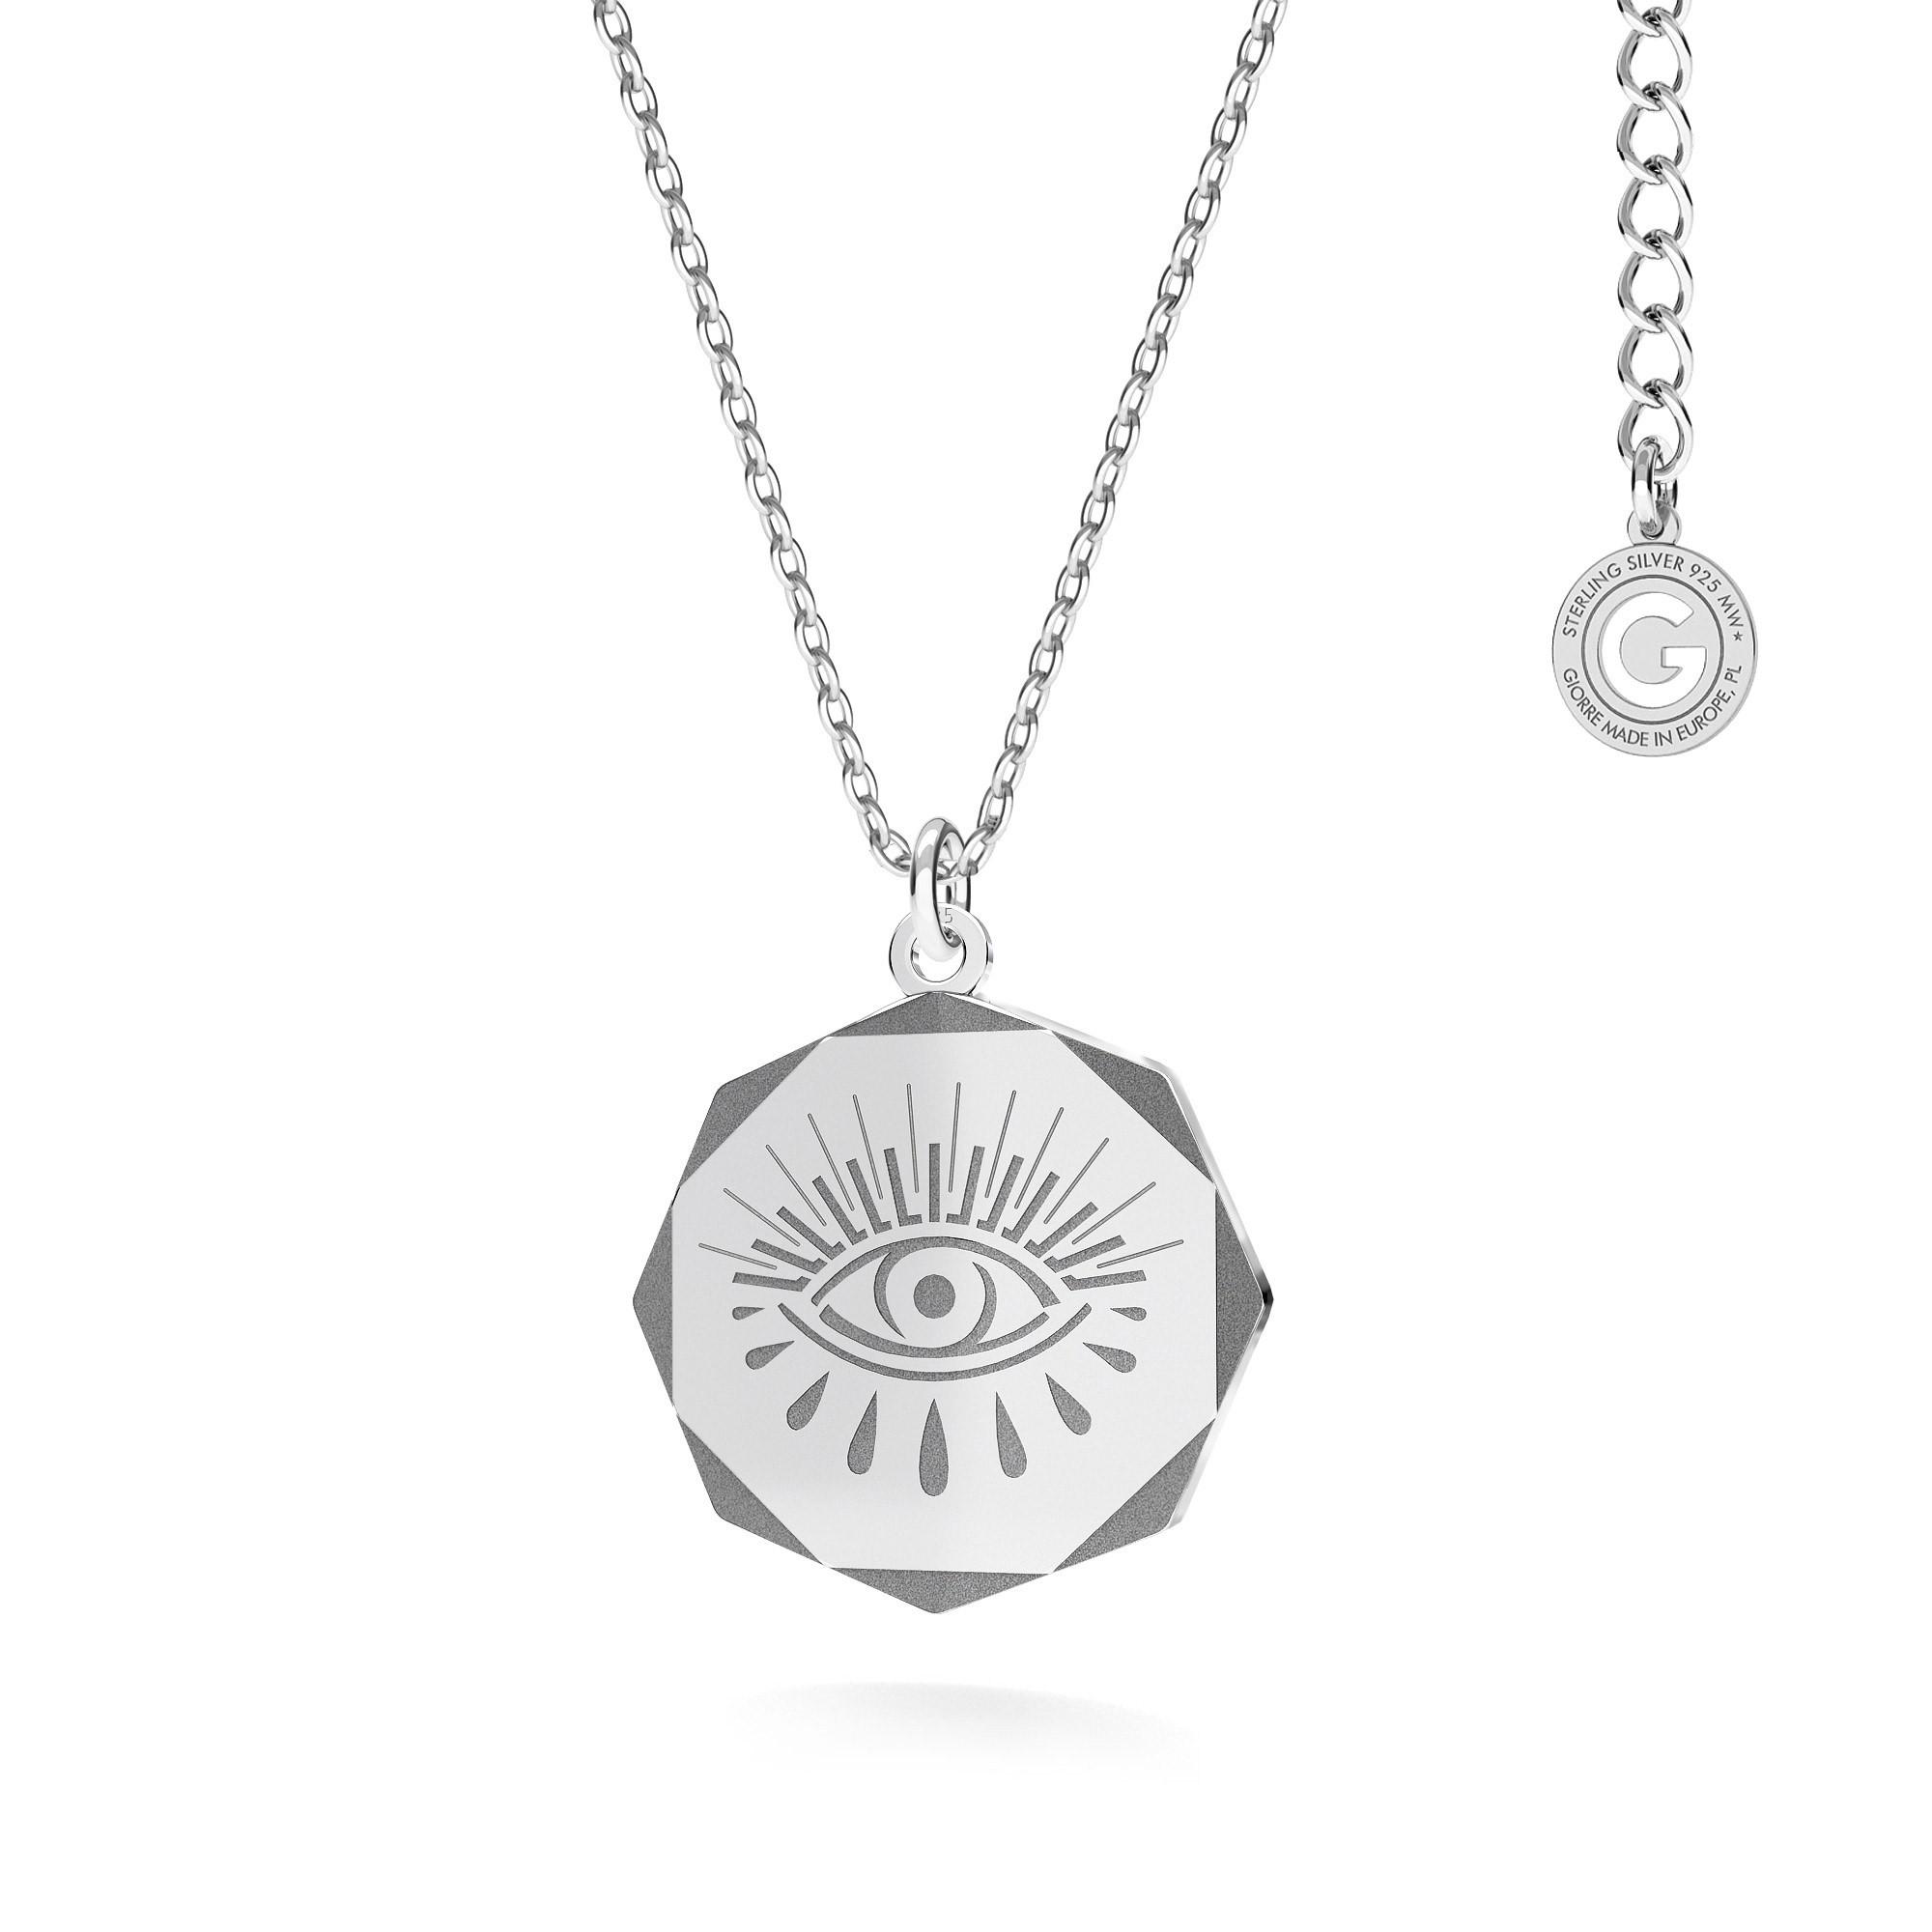 MON DÉFI Necklace - Hamsa, sterling silver 925